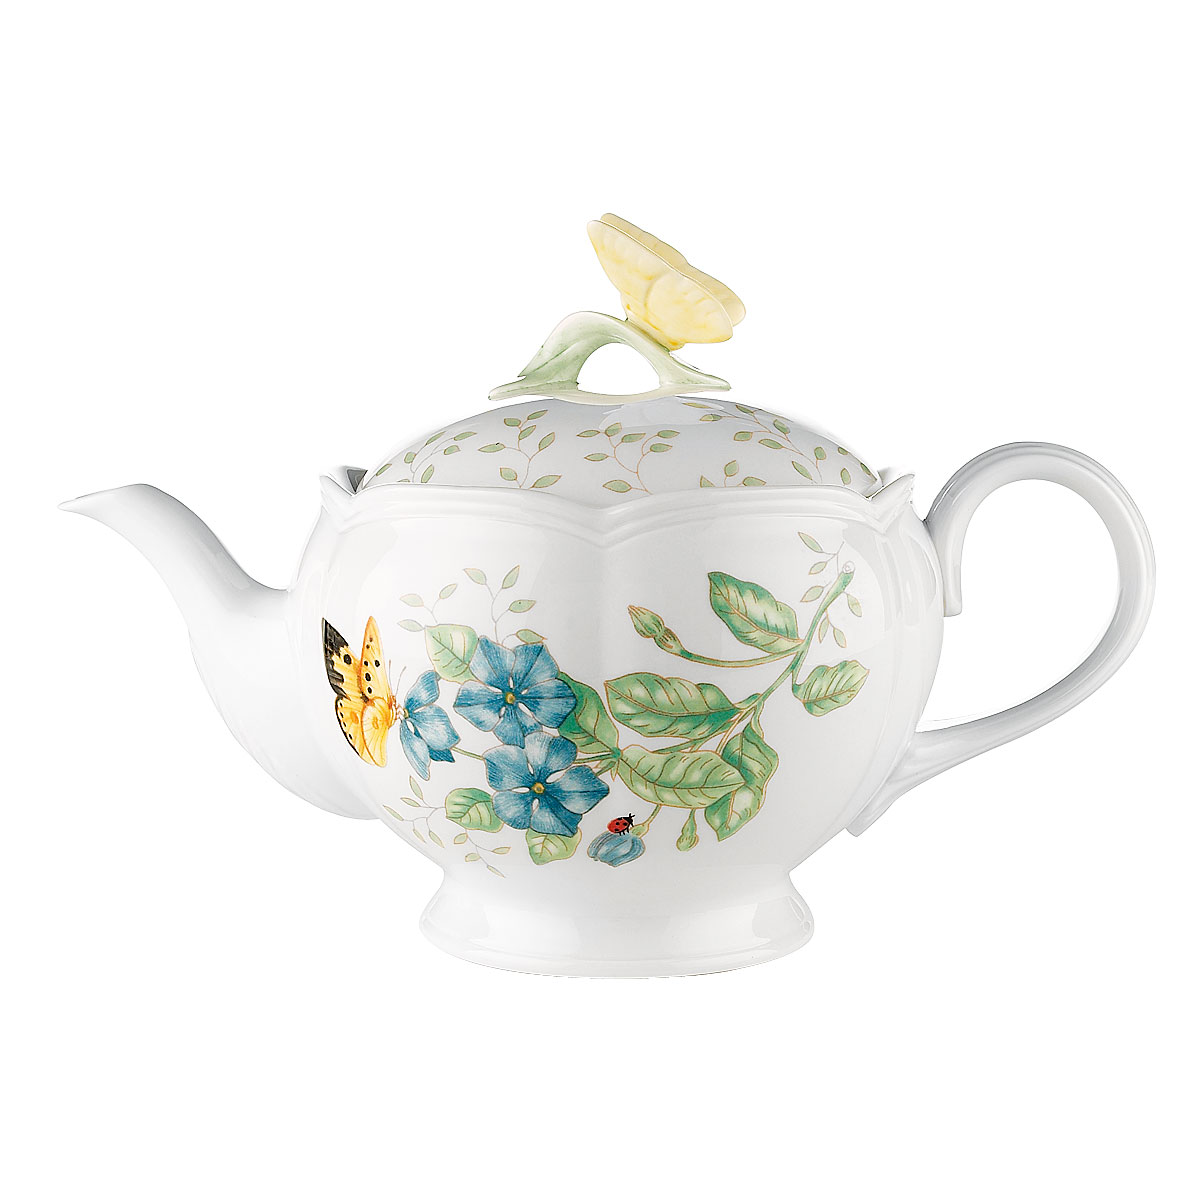 Lenox Butterfly Meadow Dinnerware Teapot With Lid